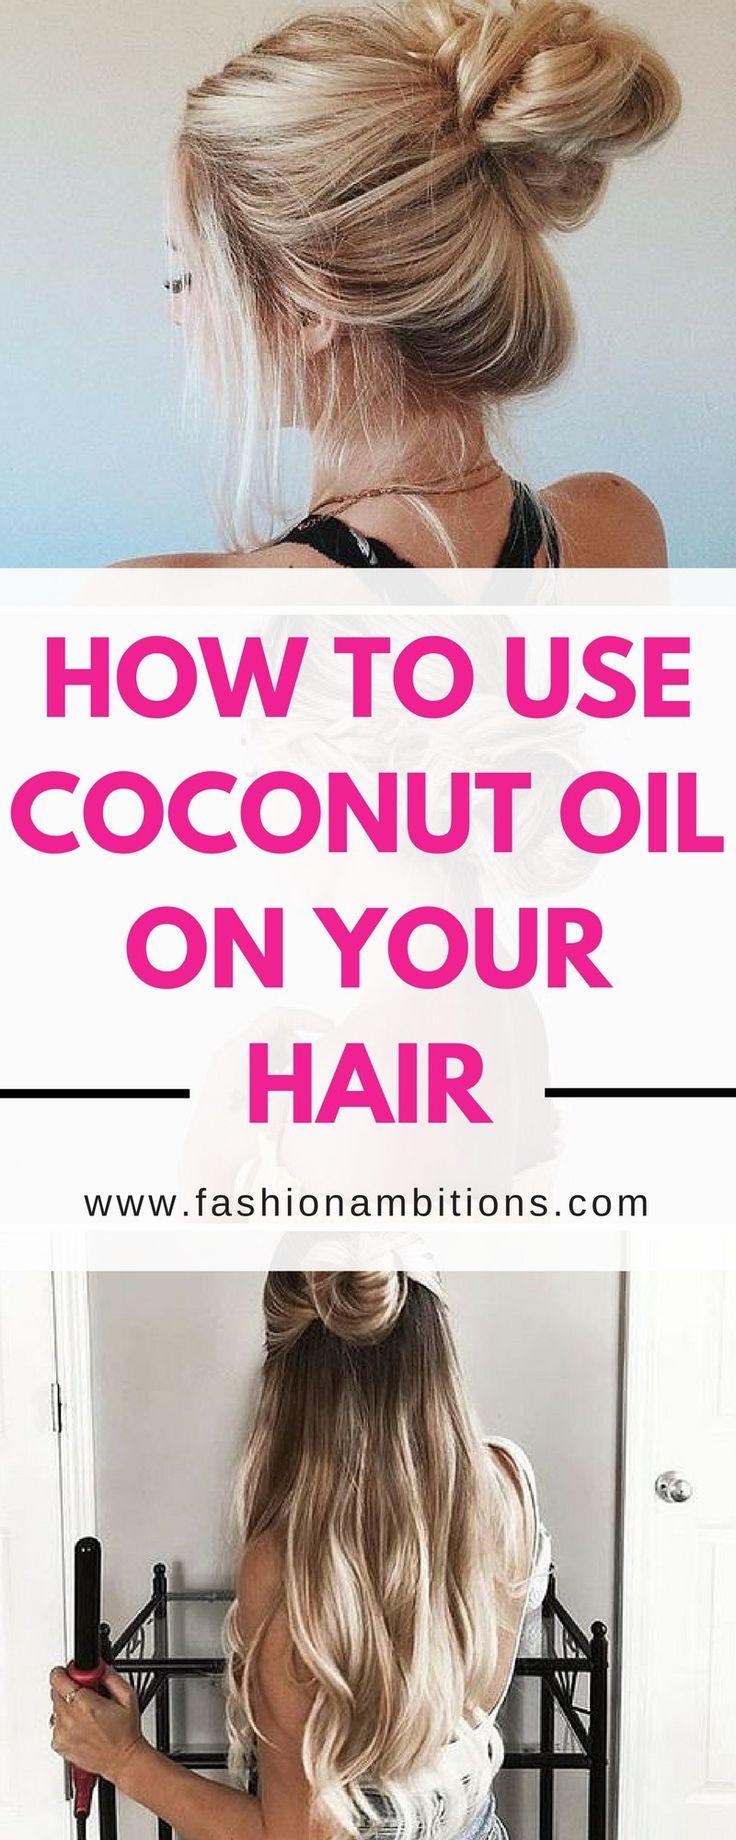 Best  Coconut Oil Uses Ideas On Pinterest - How to use coconut oil on hair